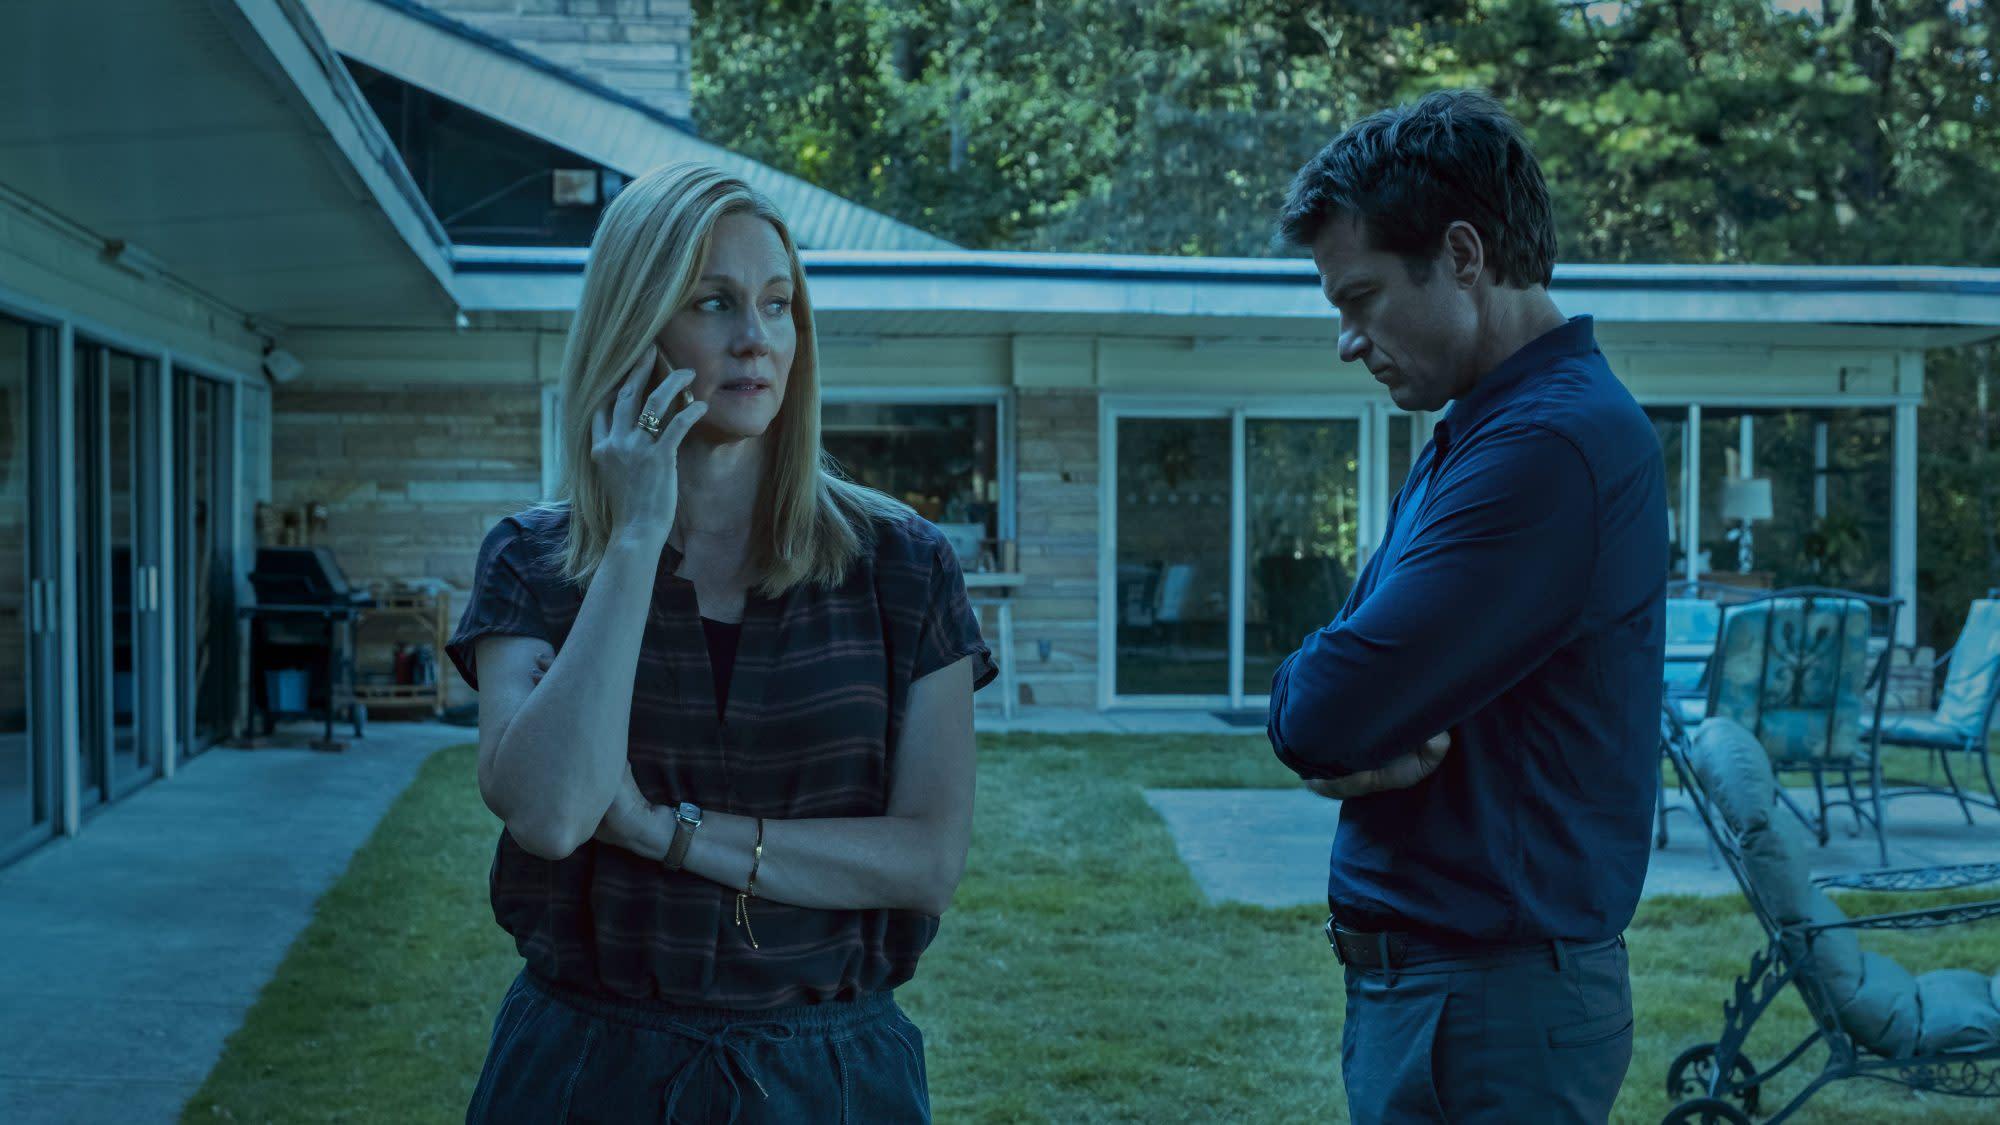 'Ozark' Renewed For Supersized Fourth & Final Season By Netflix